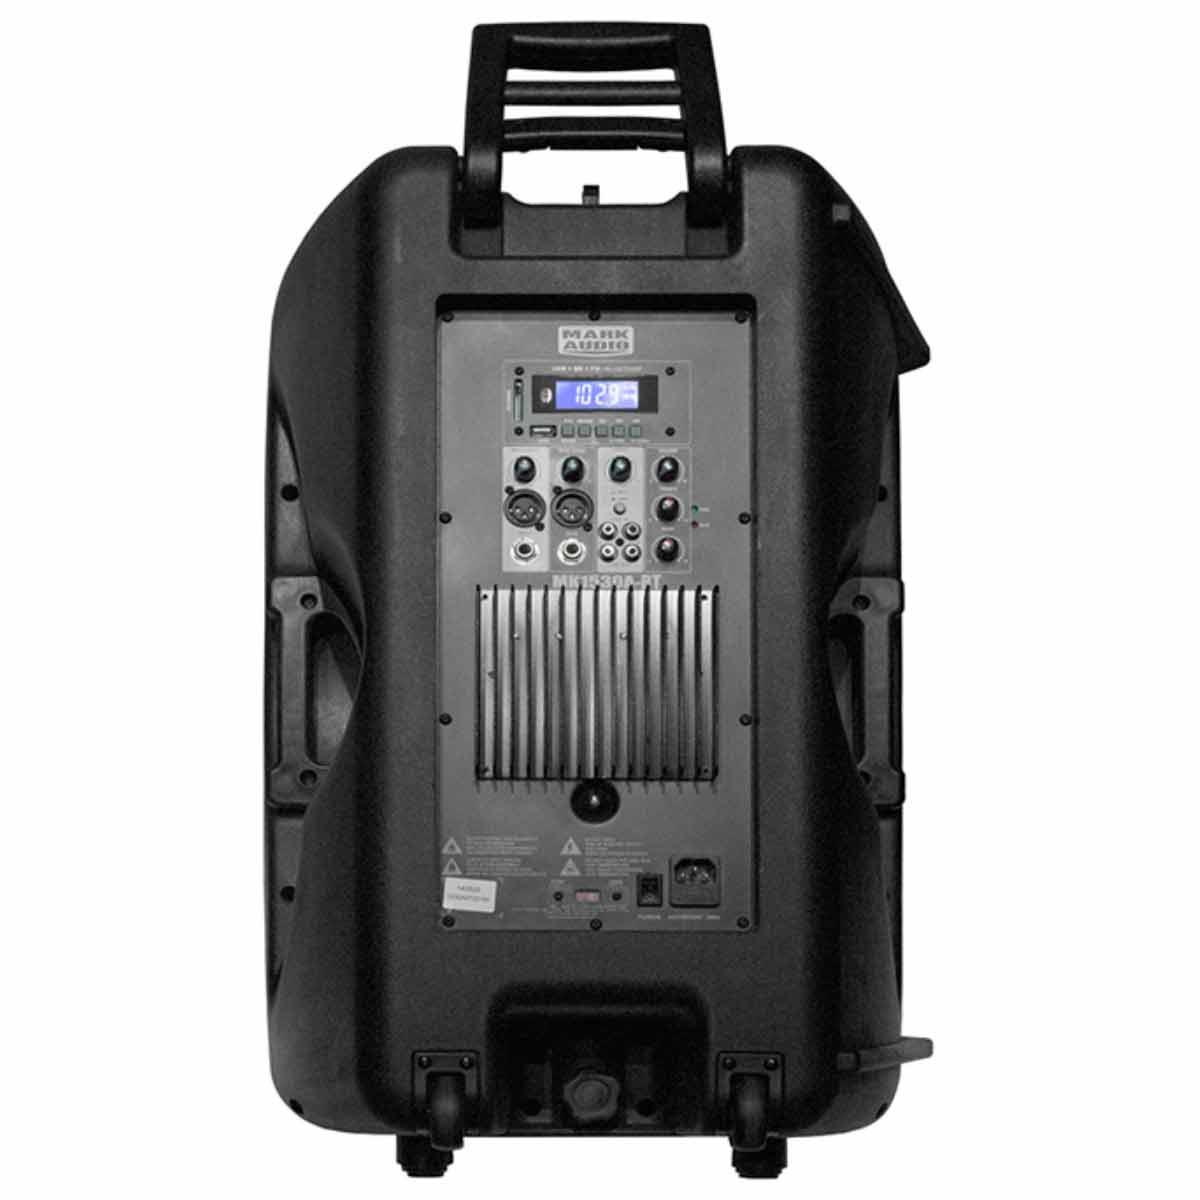 MK1530ABT - Caixa Ativa 300W c/ Bluetooth e USB MK 1530A BT - Mark Audio